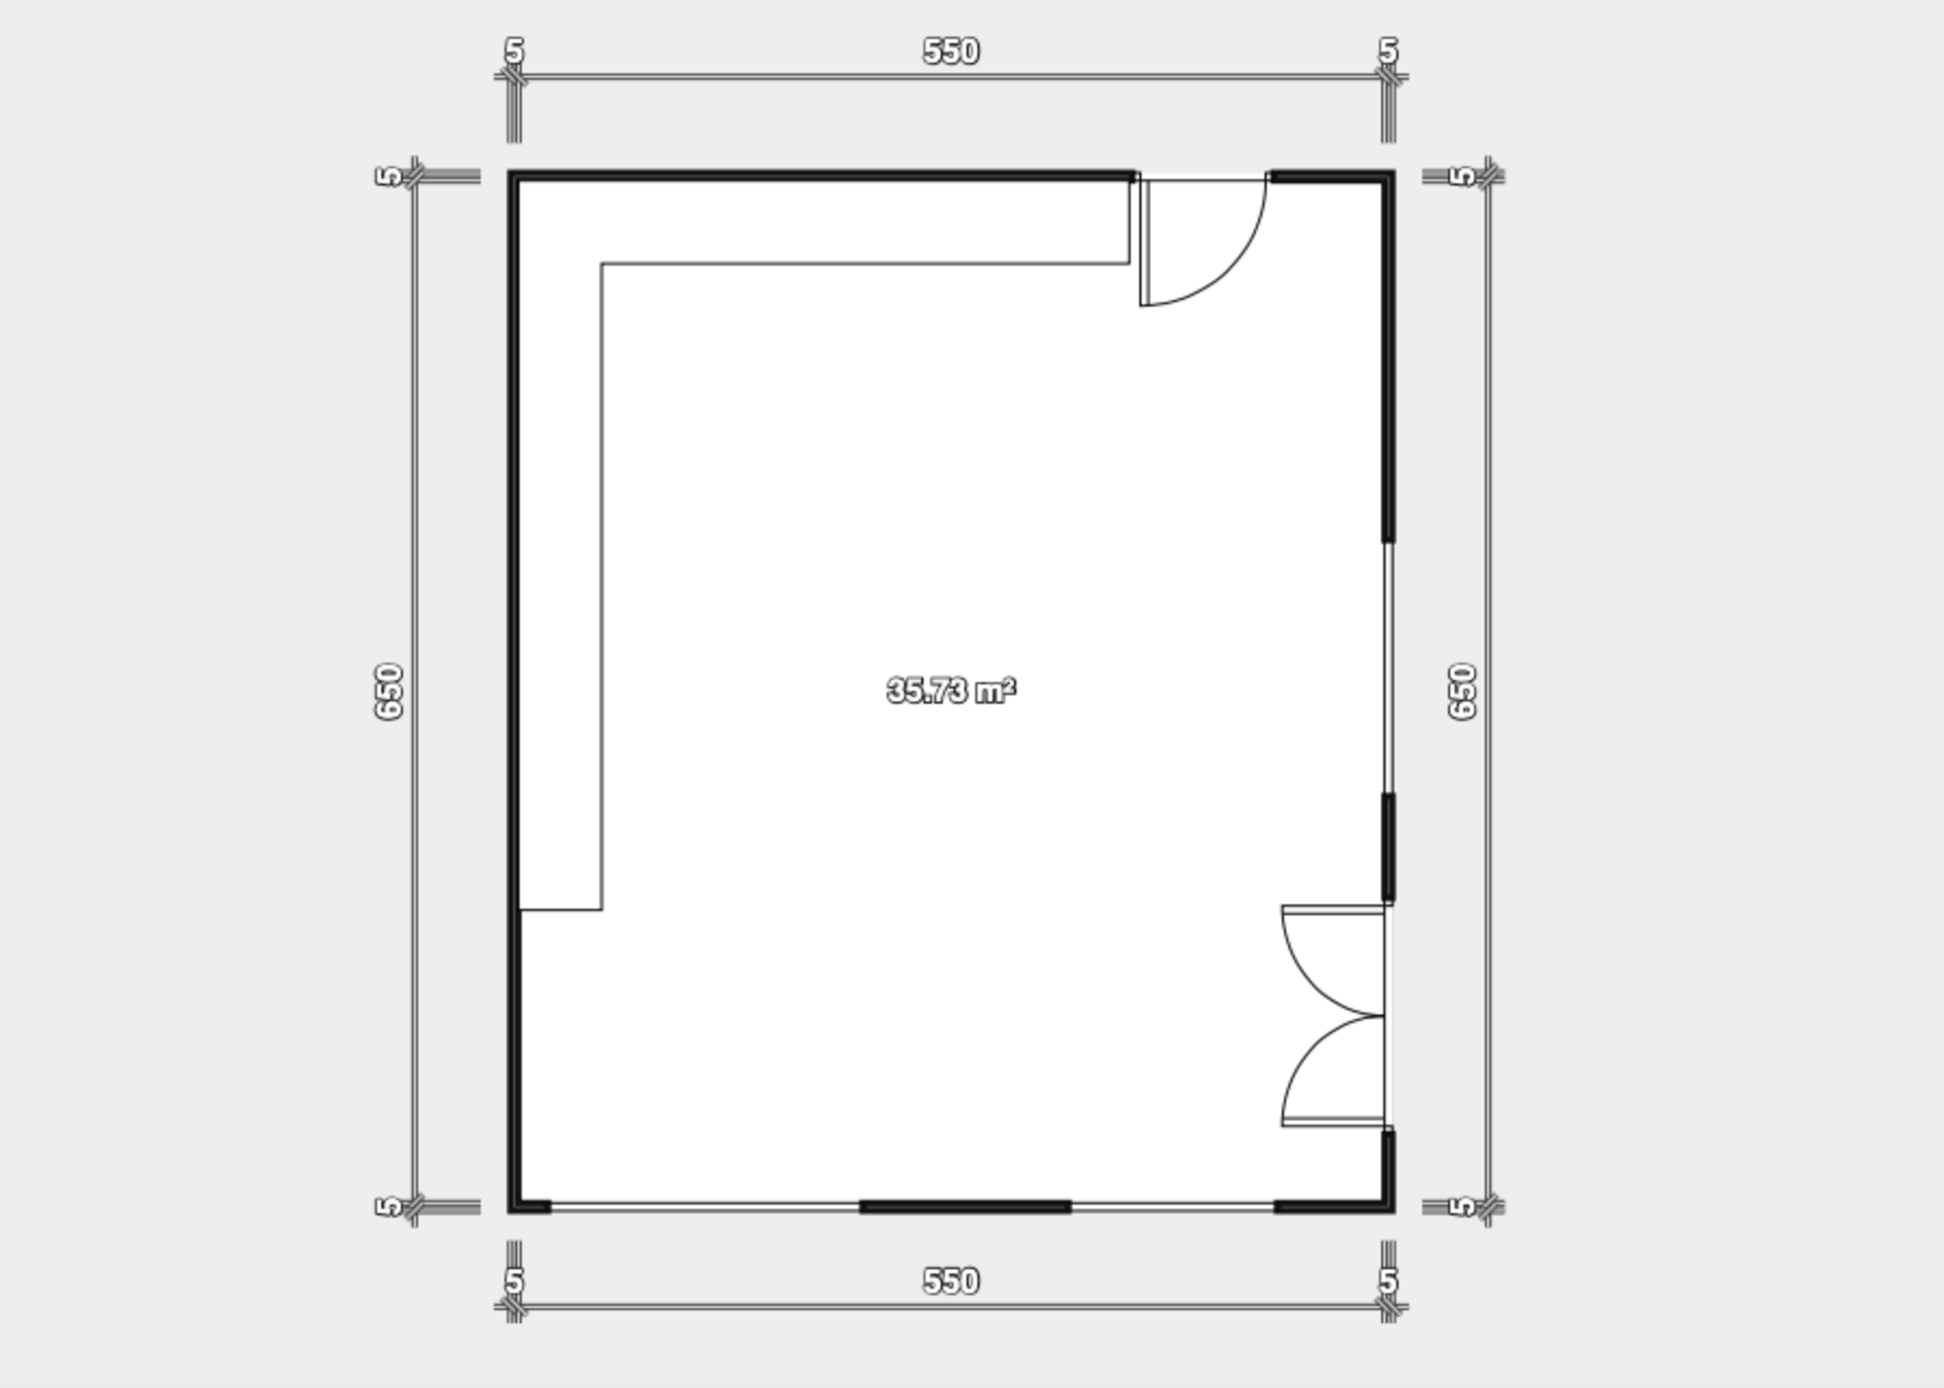 photography studio london floor plan